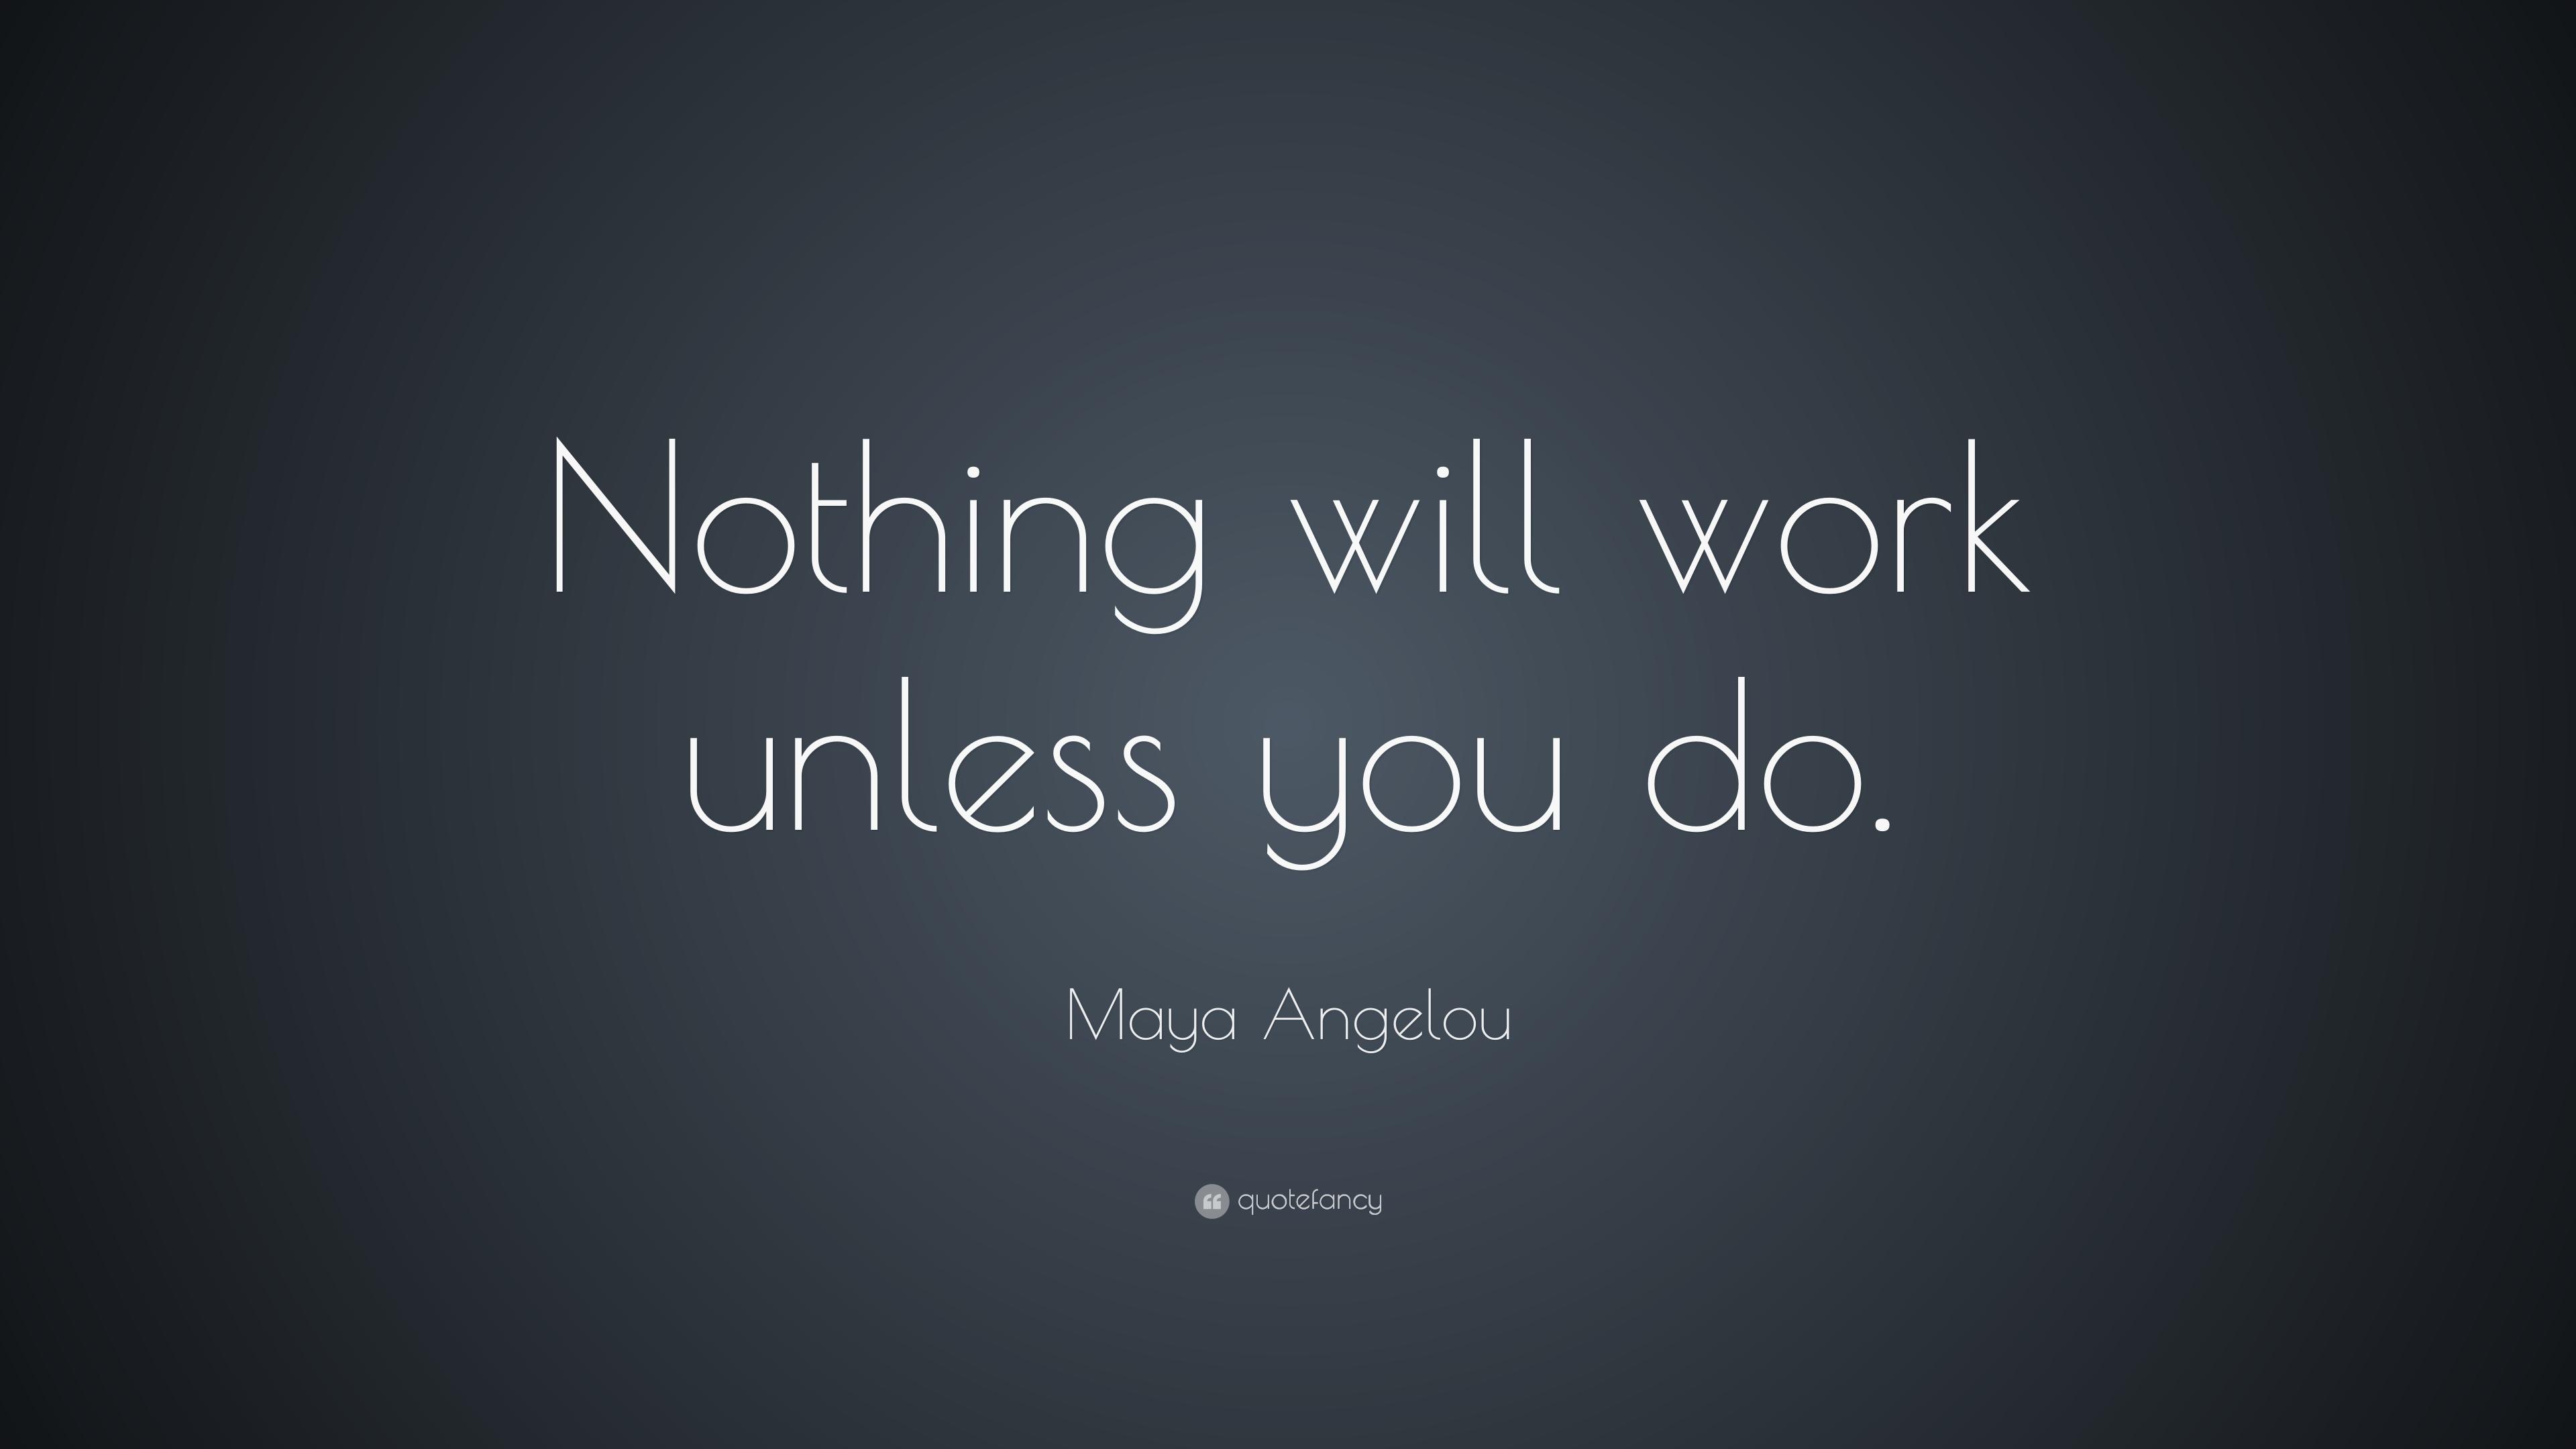 Phenomenal Woman Quotes Maya Angelou  The Phenomenal Woman  The Return To Salone